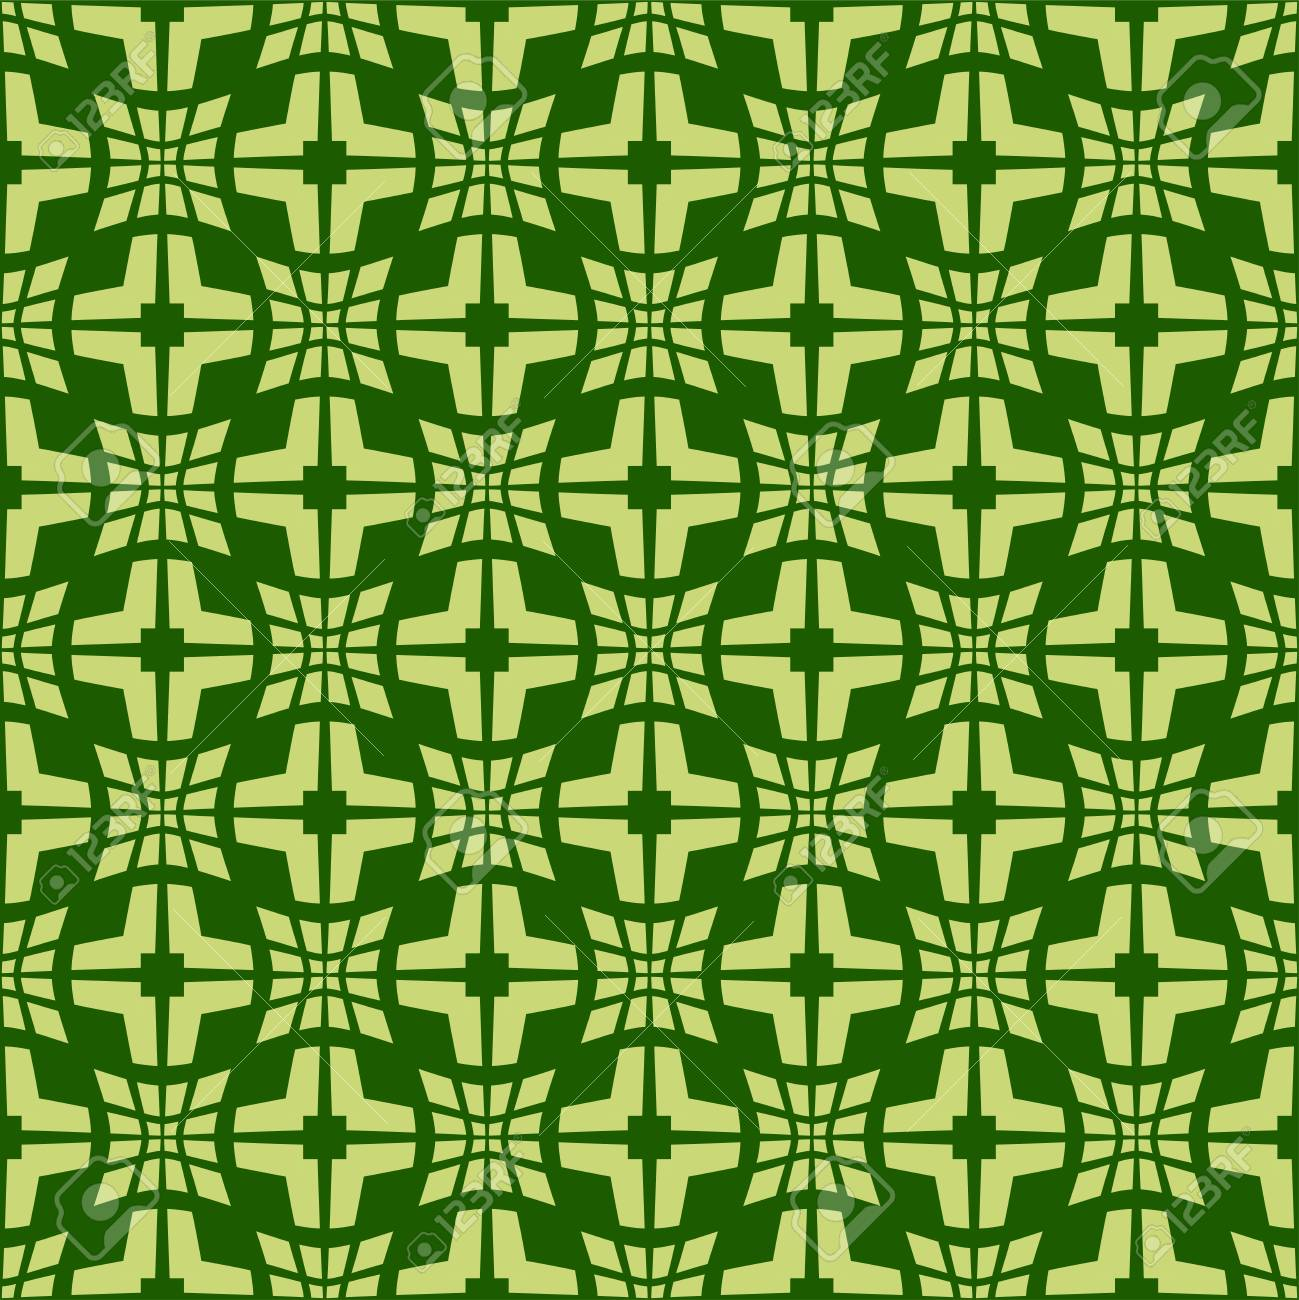 Light green pattern on dark green background. Seamless stylish texture. Creative abstract vector. - 120846257